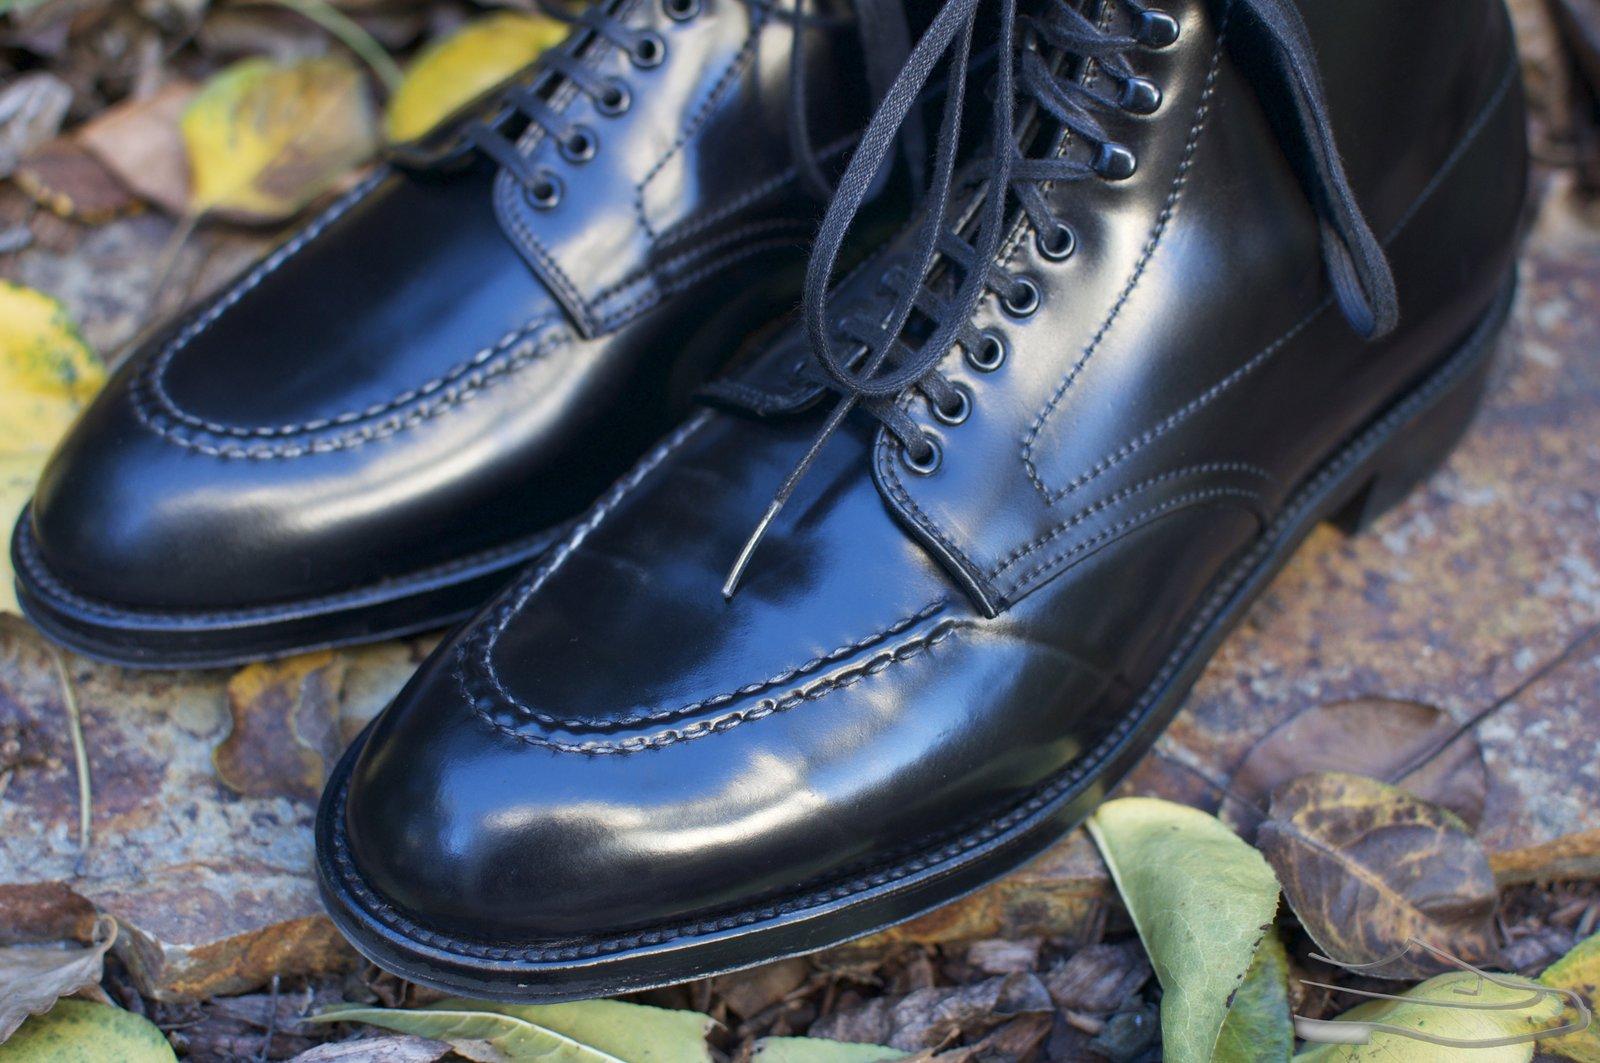 Alden Black Shell Cordovan U-Tip Boots - 2020-11-27 - 2.jpg